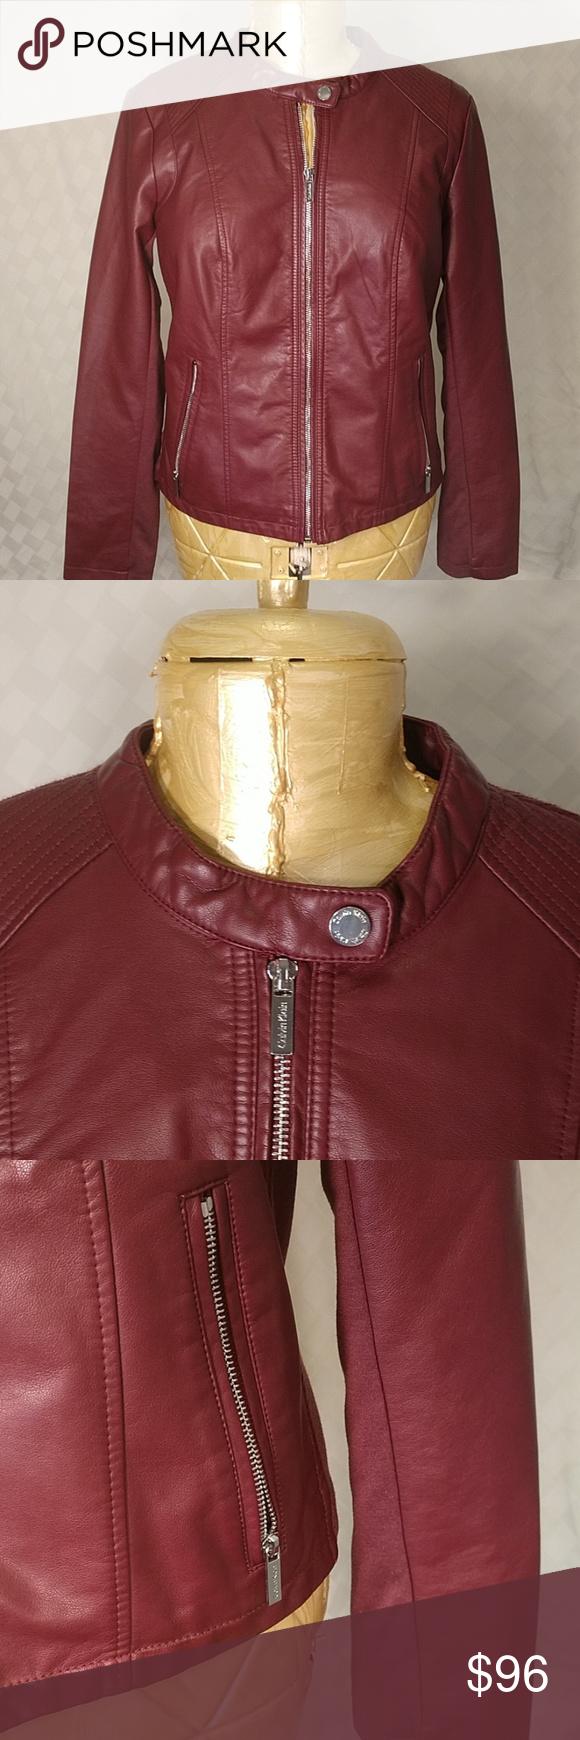 Calvin Klein Marron Faux Leather Moto Jacket L Picturing